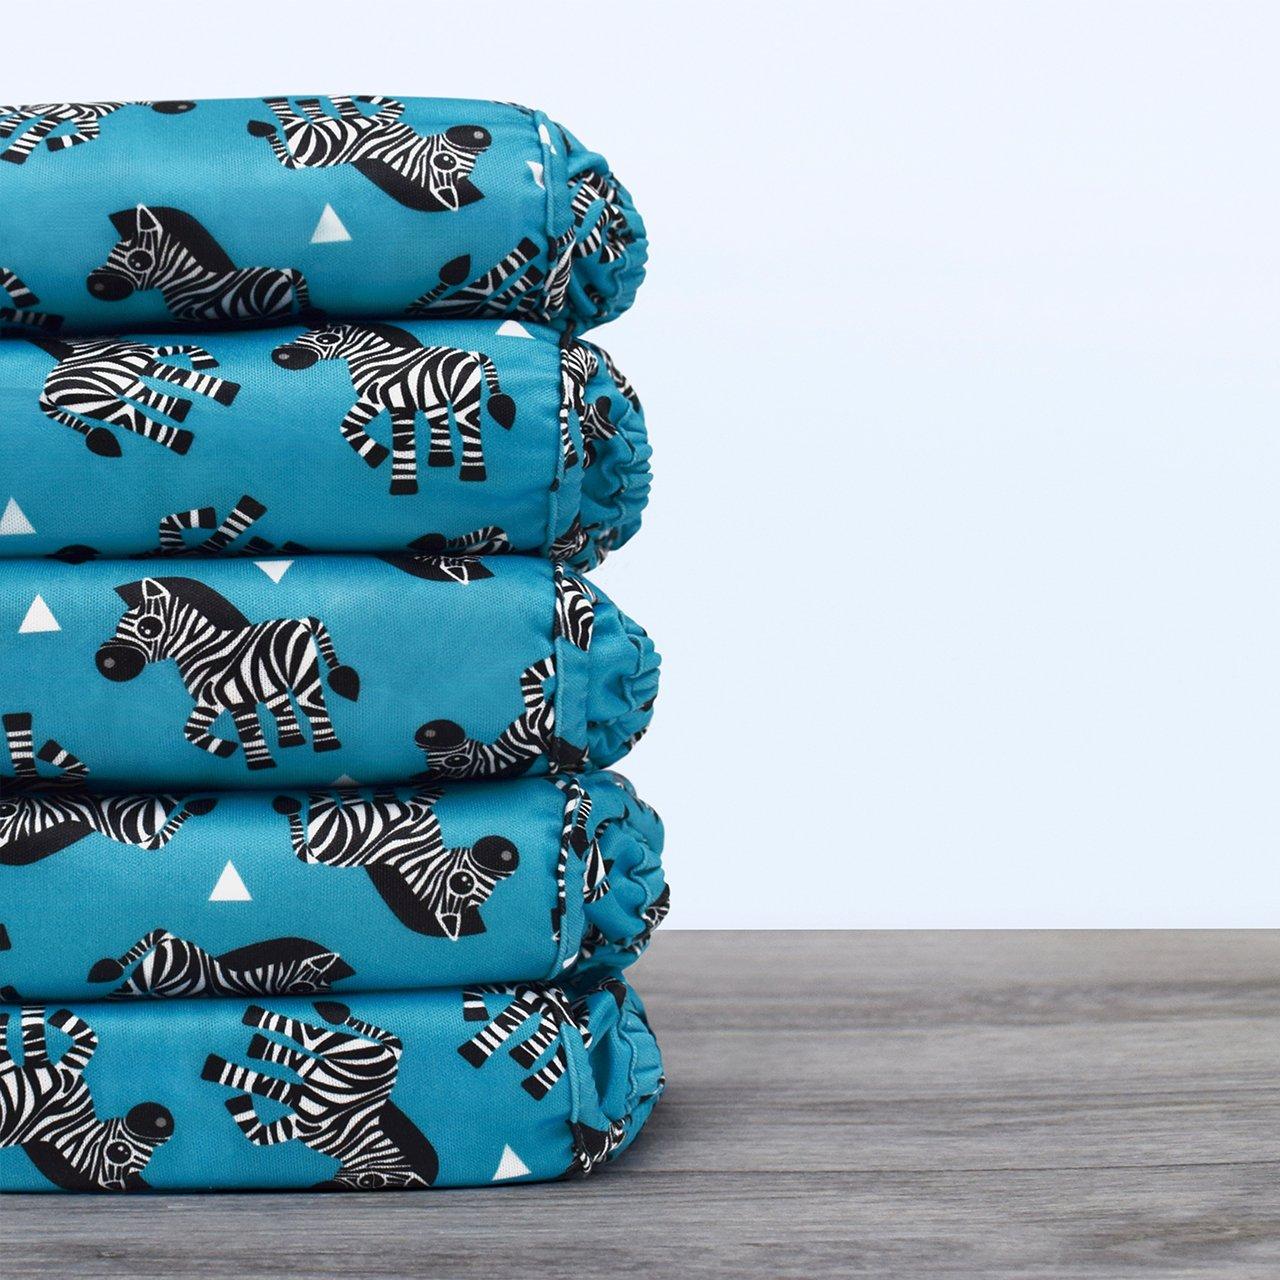 Bambino Mio Miosoft Reusable Nappy Cover , Zebra Crossing 9kg+ Size 2